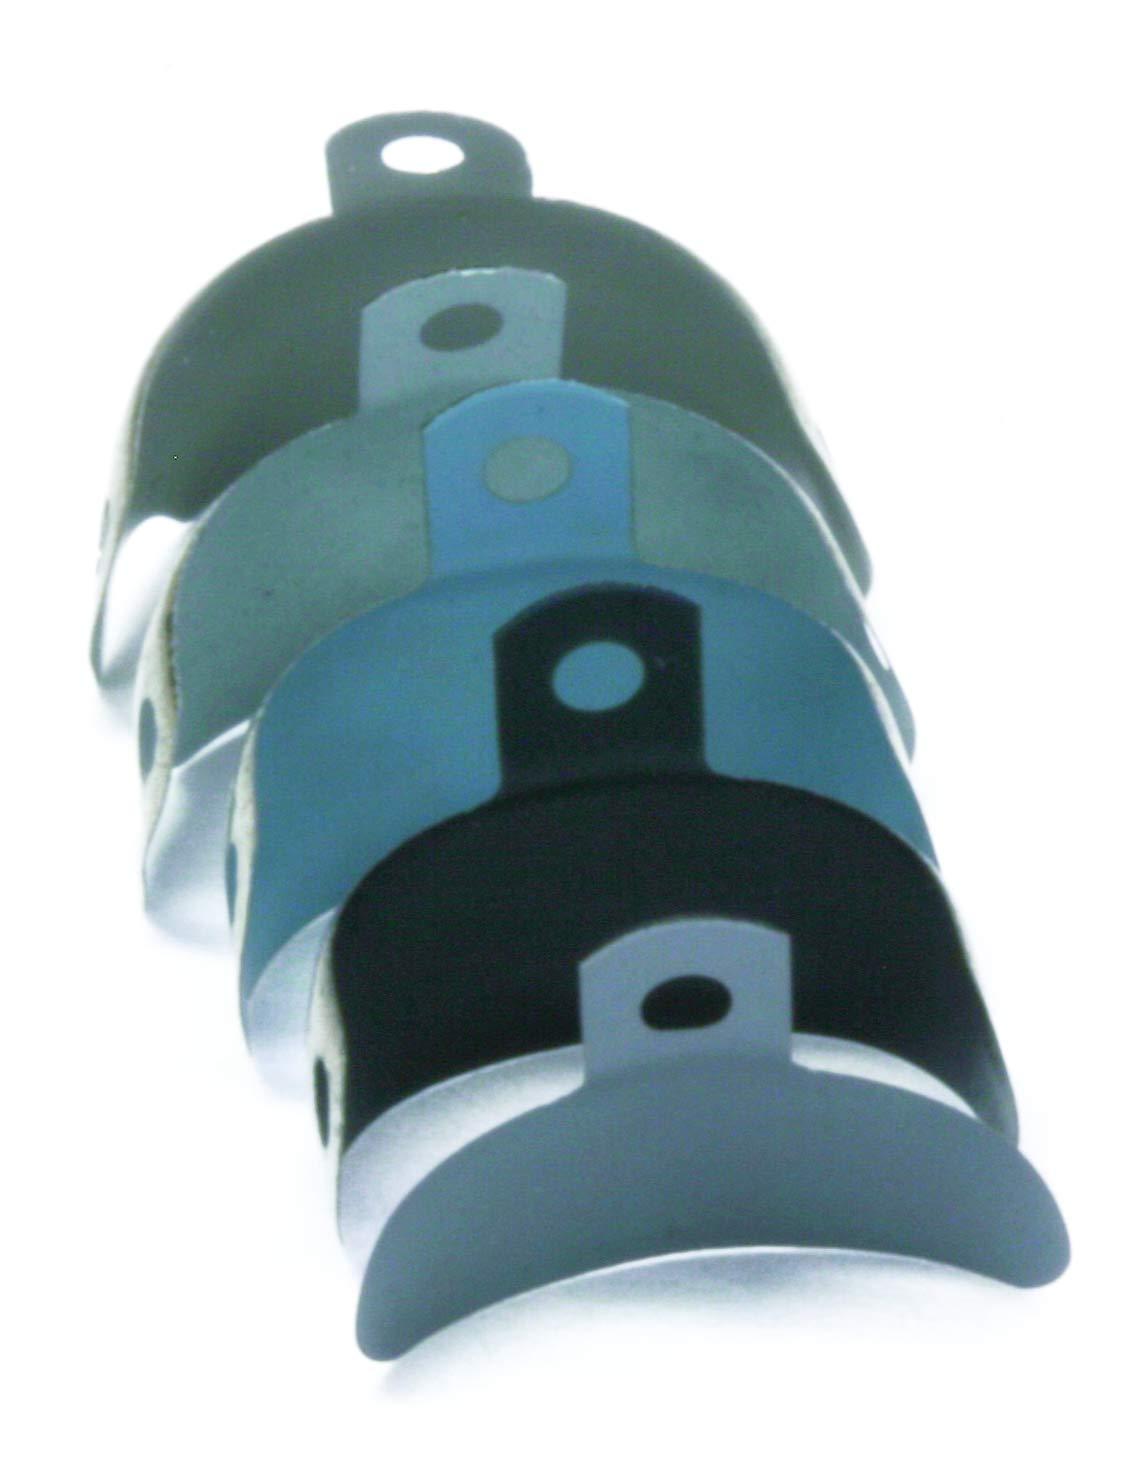 DNC Palodent Large discharge sale Plus EZ Coat Bx New York Mall Matrices 4.5mm 50